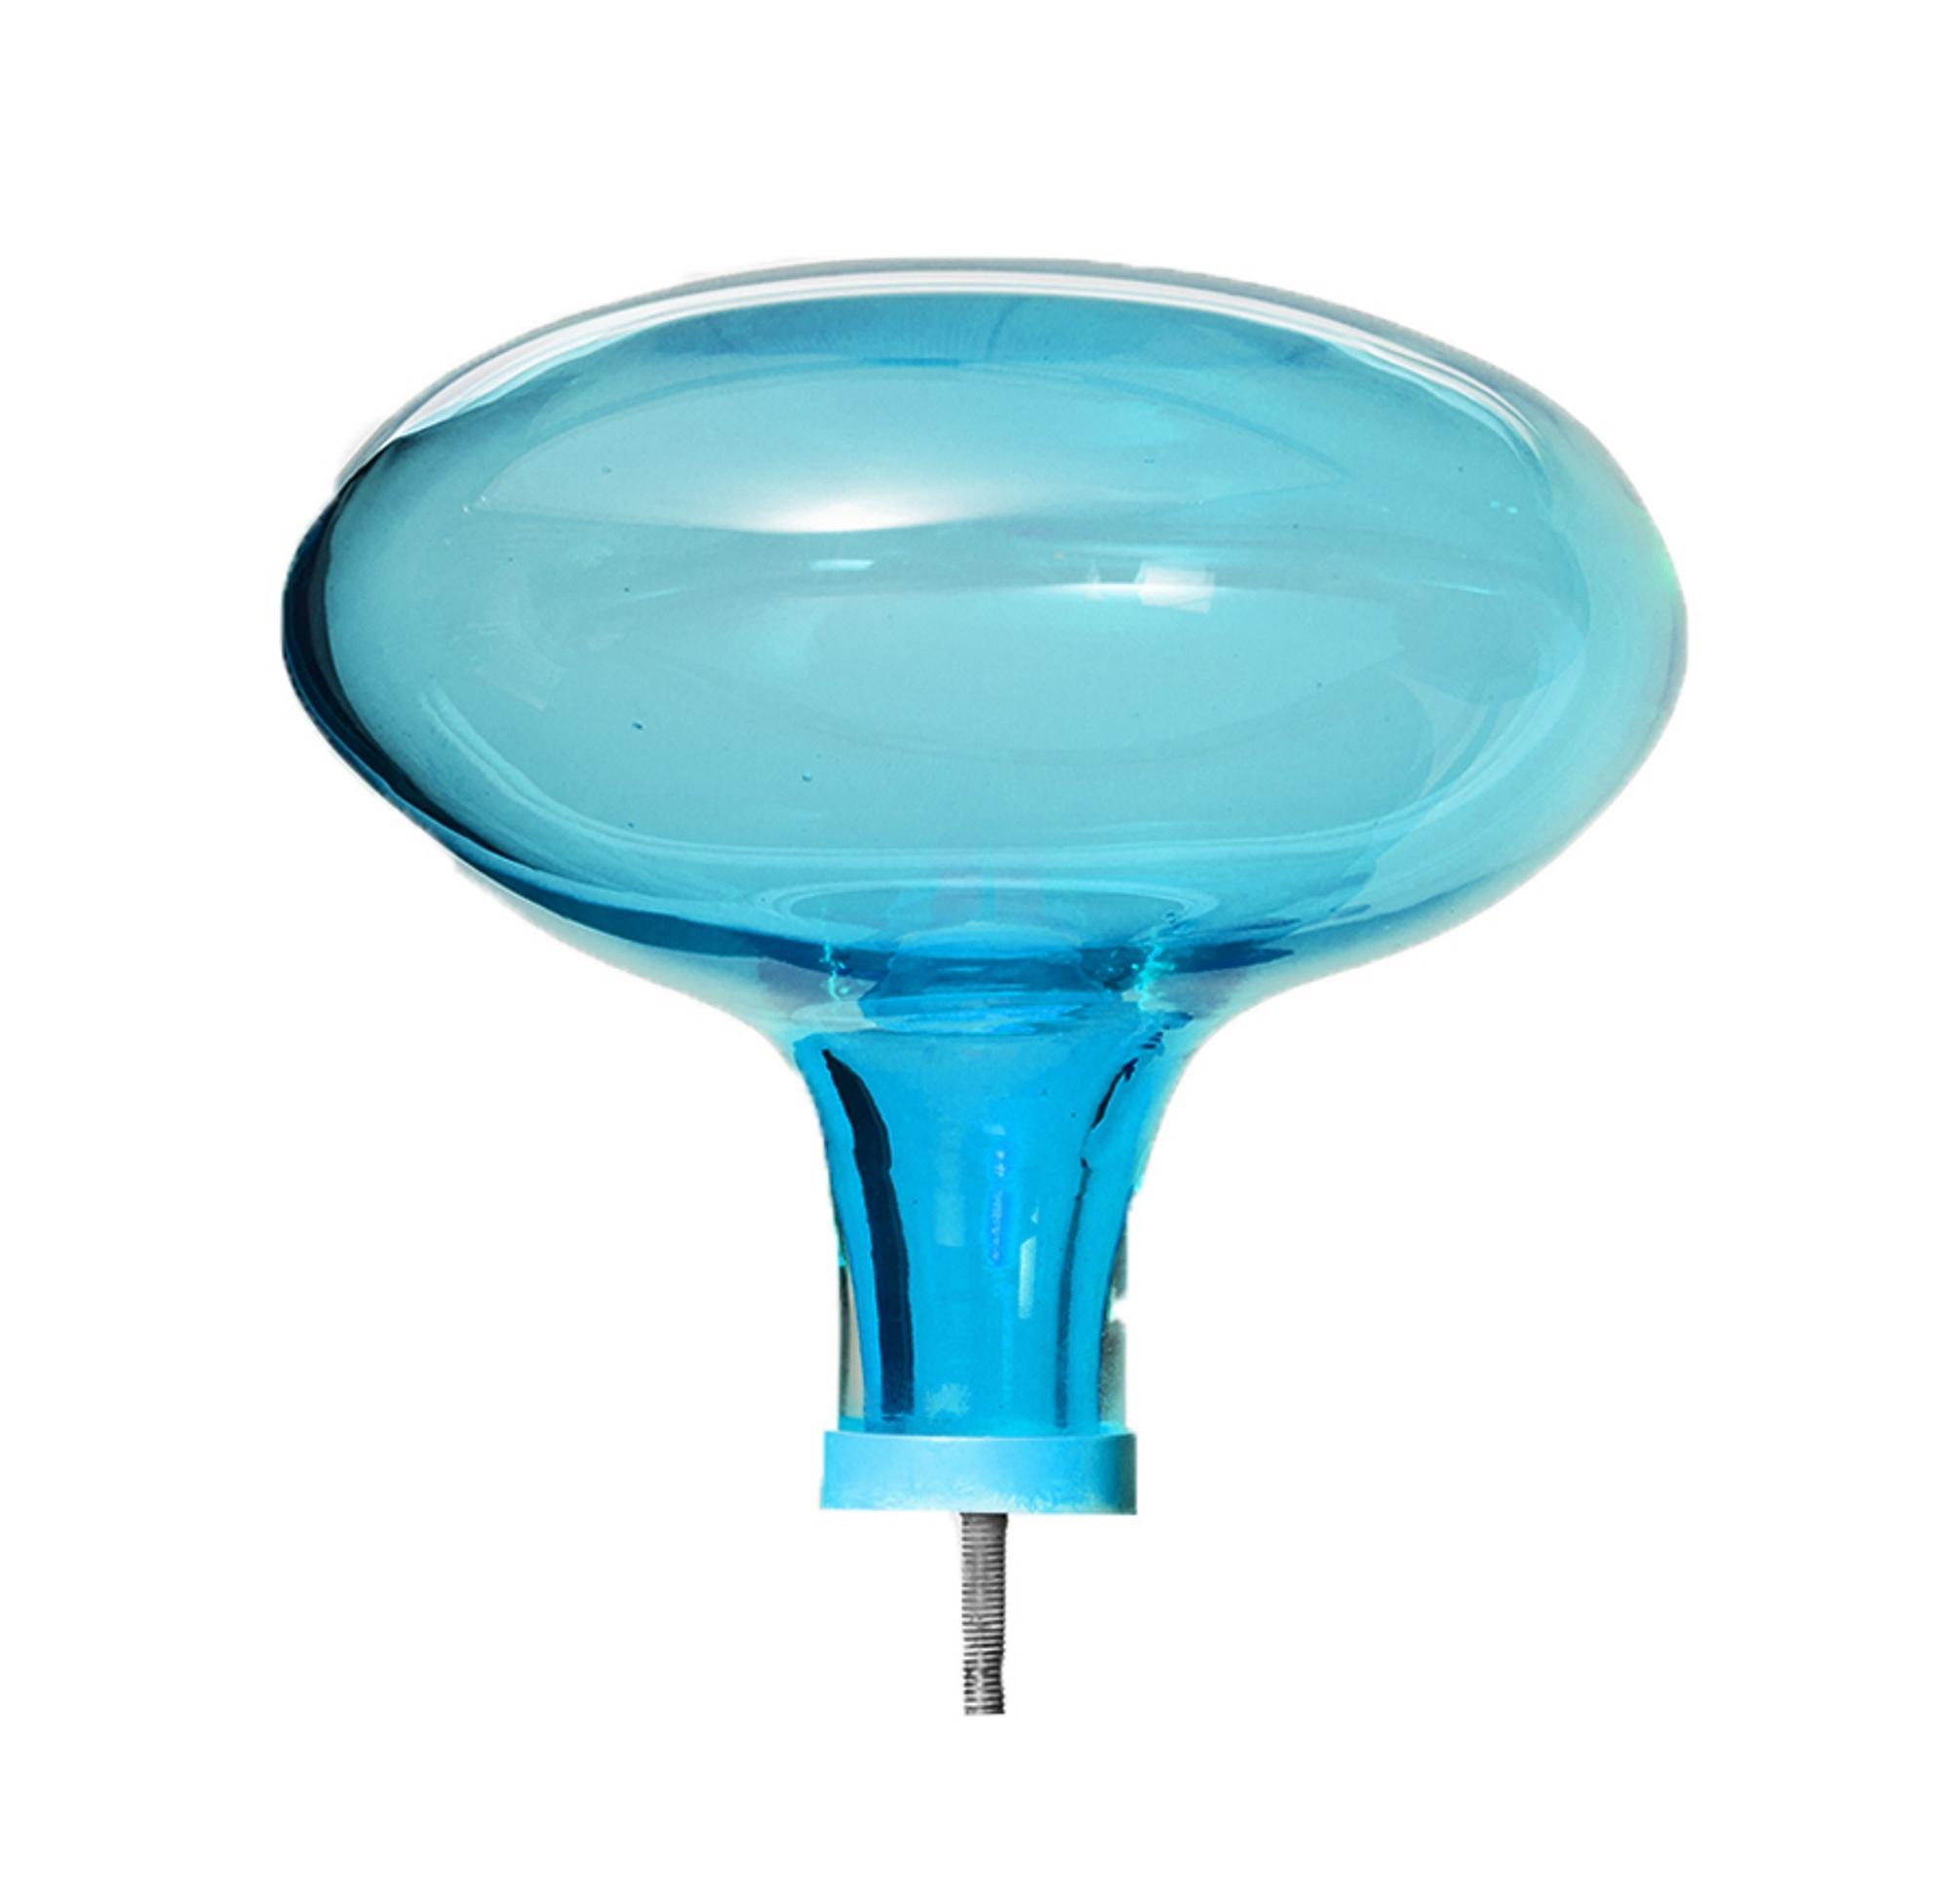 Bubble Garderobenhaken Groß Petite Friture-Blau